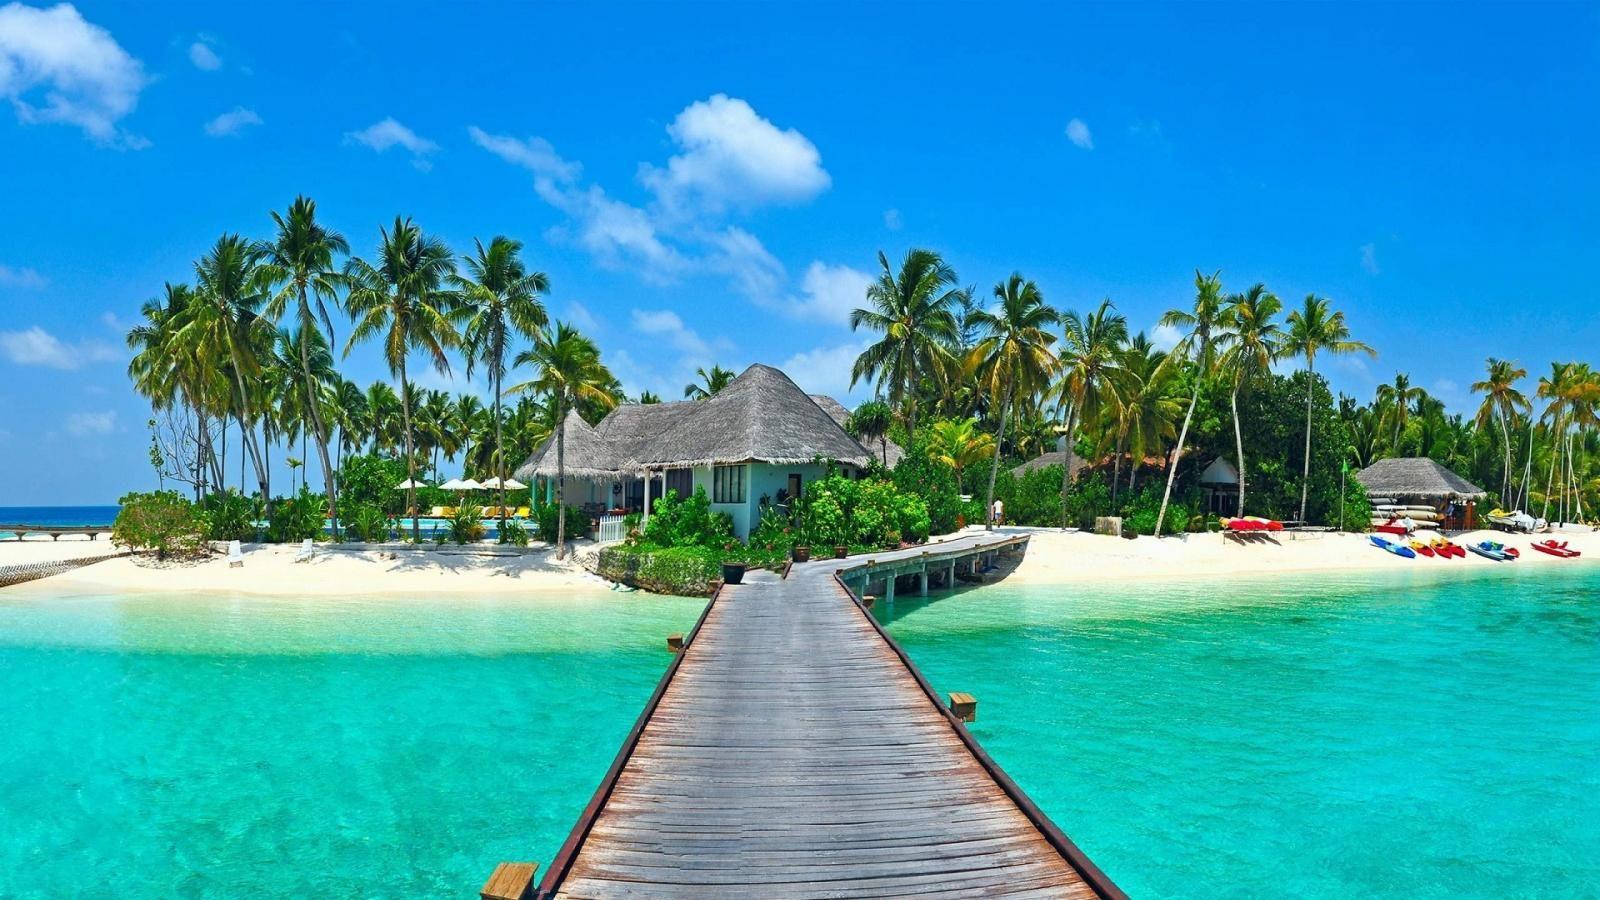 Beach Resort Mind Blowing Nature Hd Wallpapers 1600x900 Resolution Paisajes Lugares Para Visitar Poses